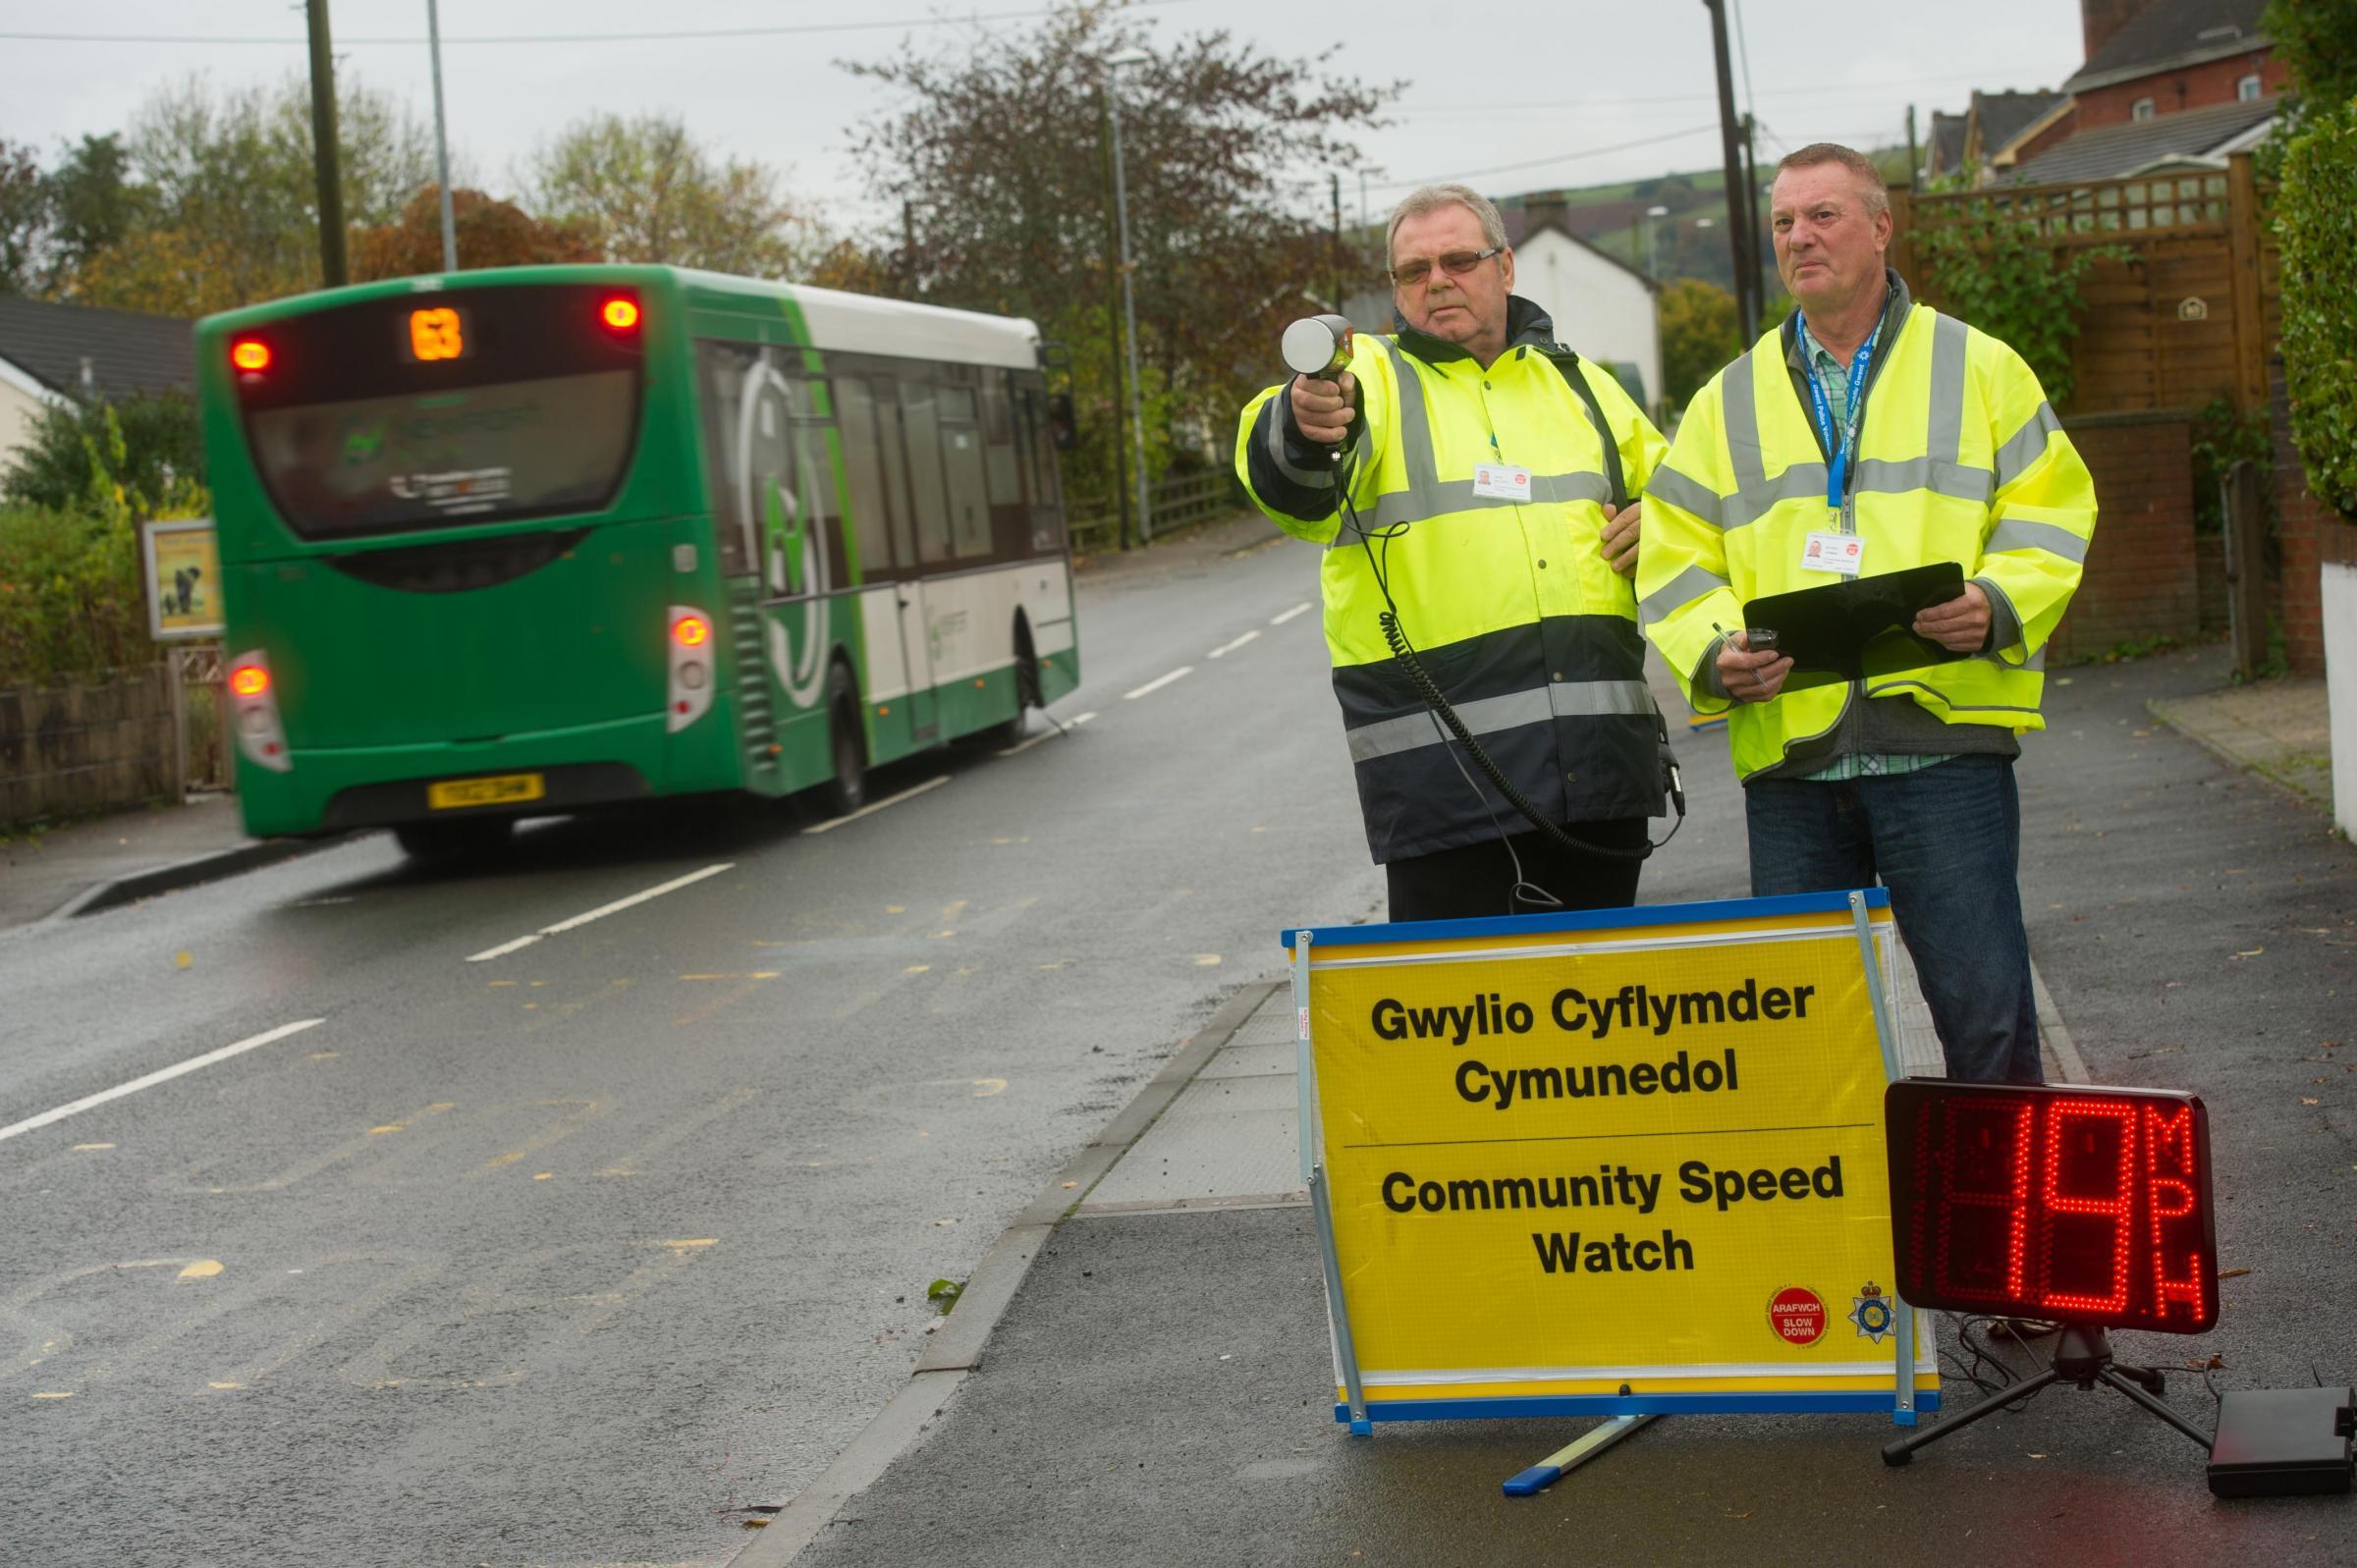 Eighth community speedwatch scheme set up in Gwent   South Wales Argus